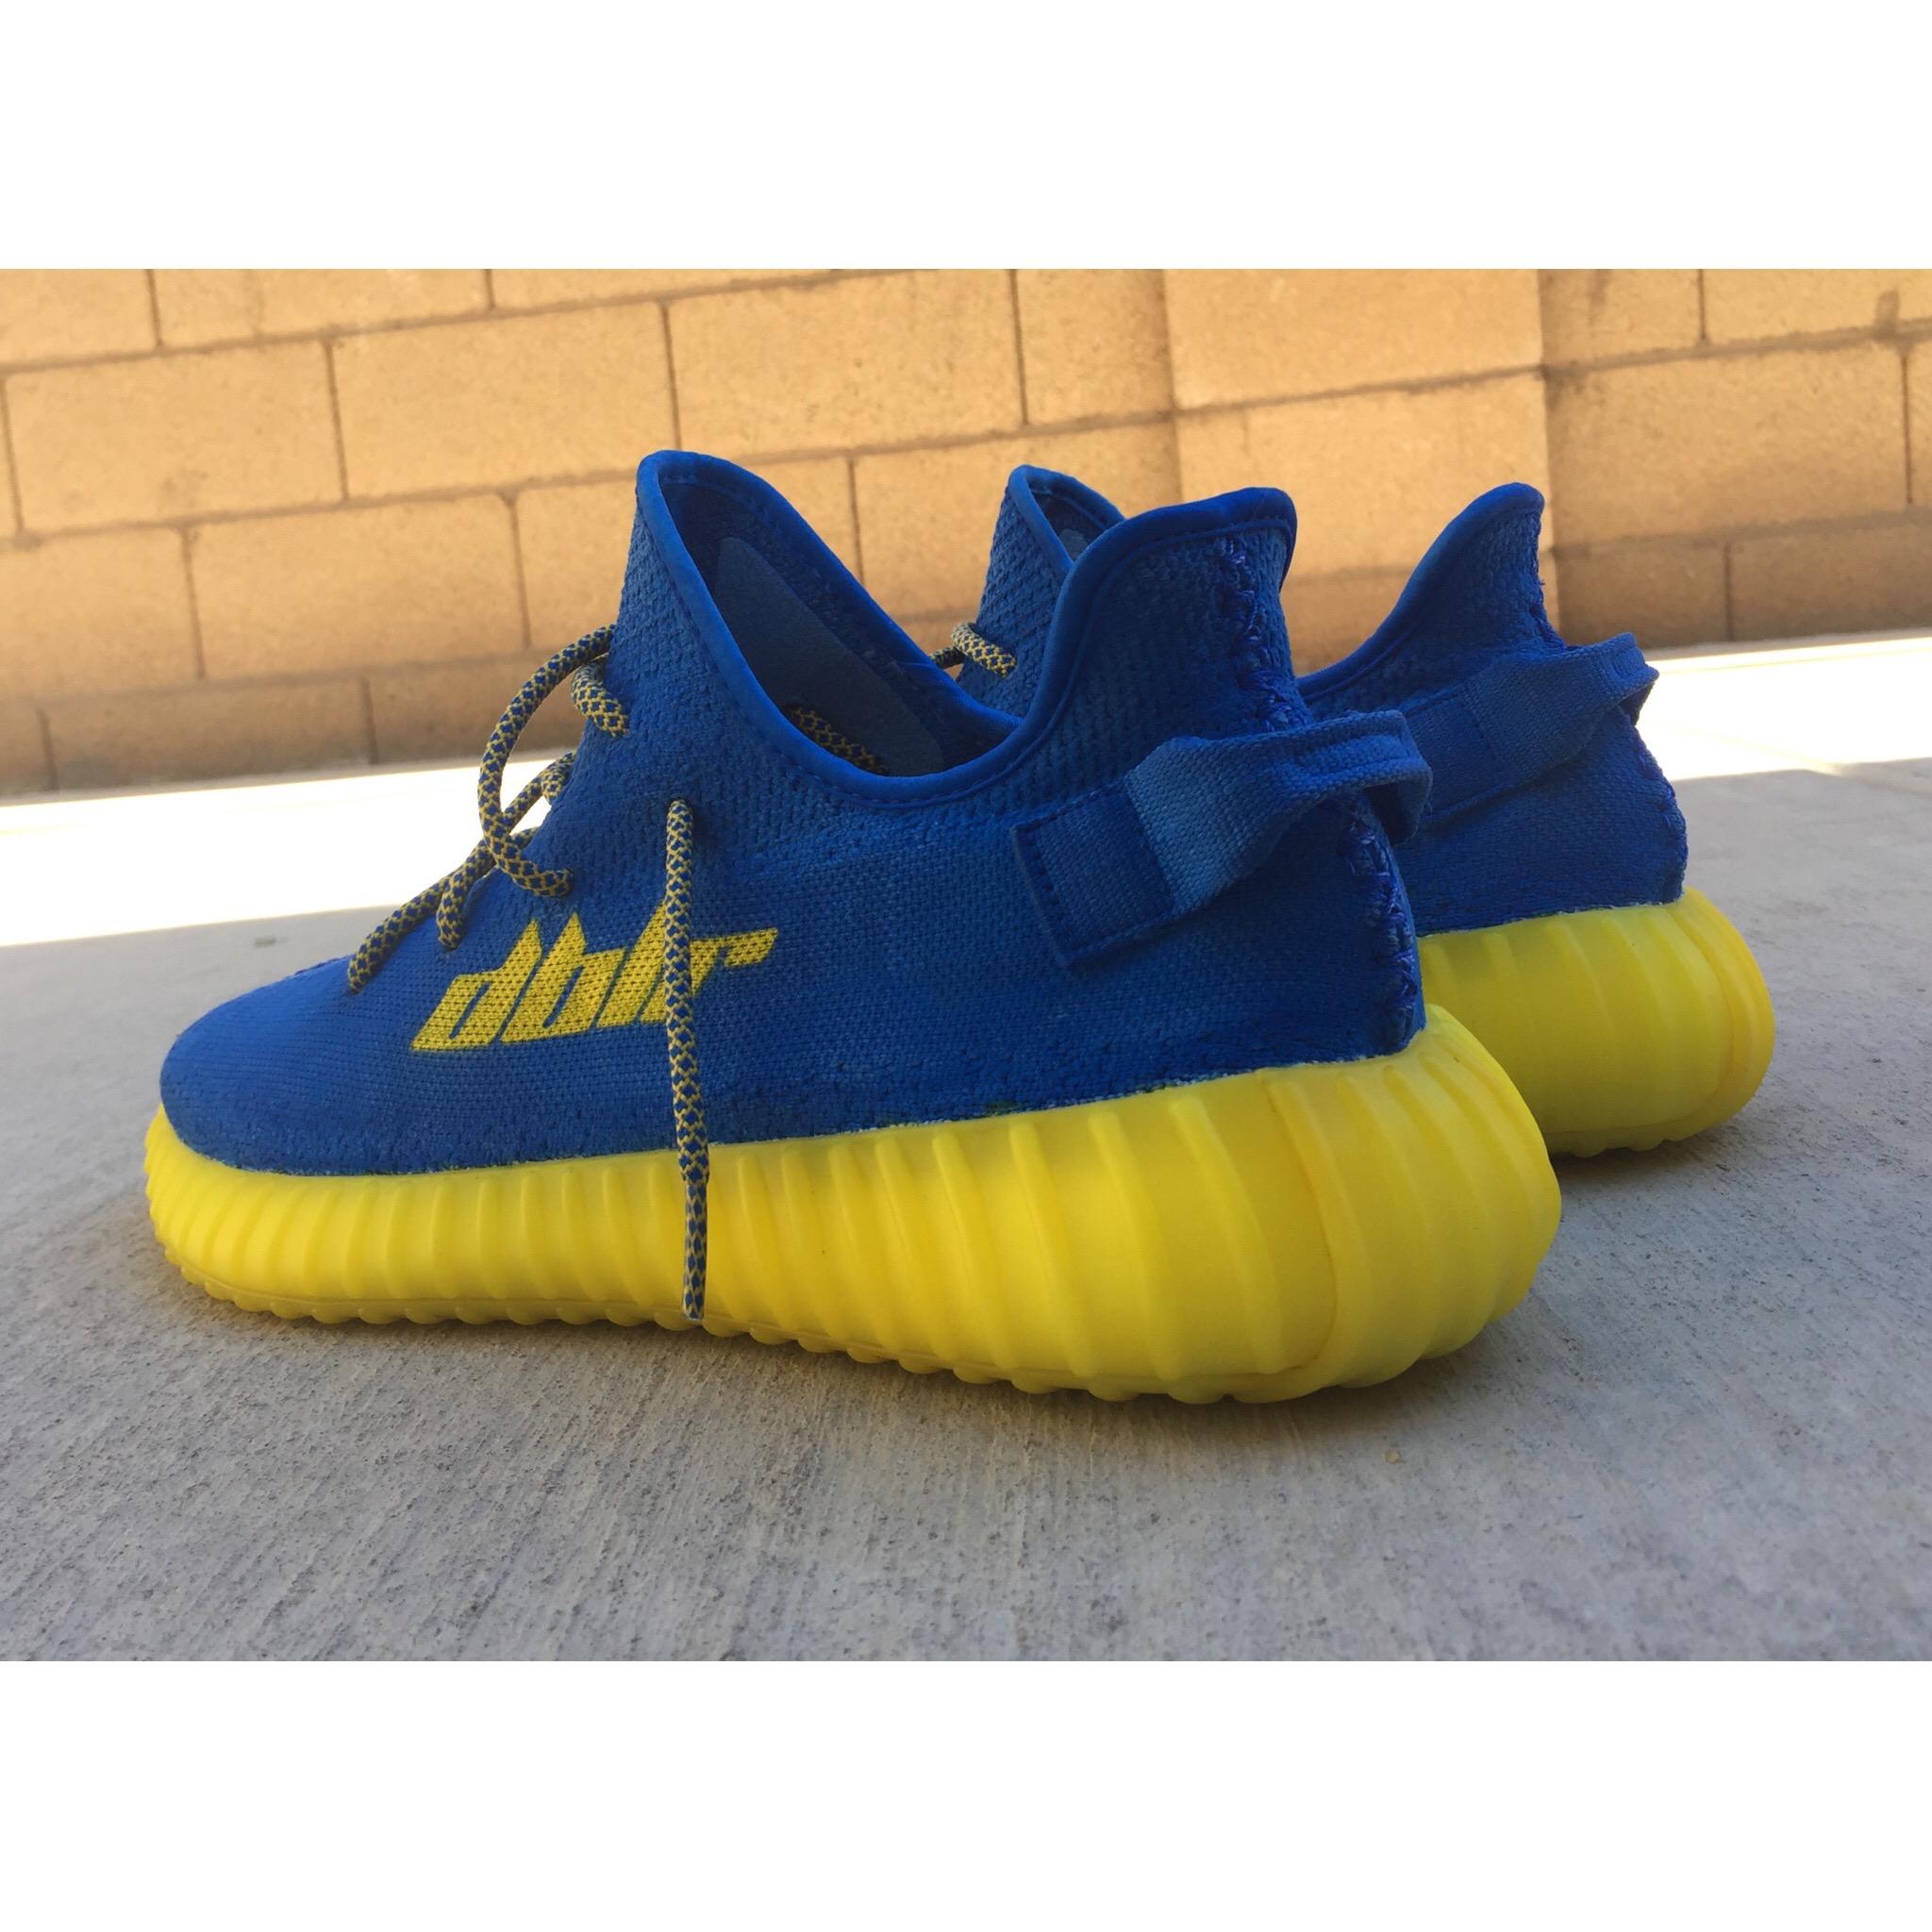 39f8d39188a46 Custom Adidas Yeezy 350 V2 x  iam DBLR x Golden State Warriors x Dubs x Dub  Nation Boost